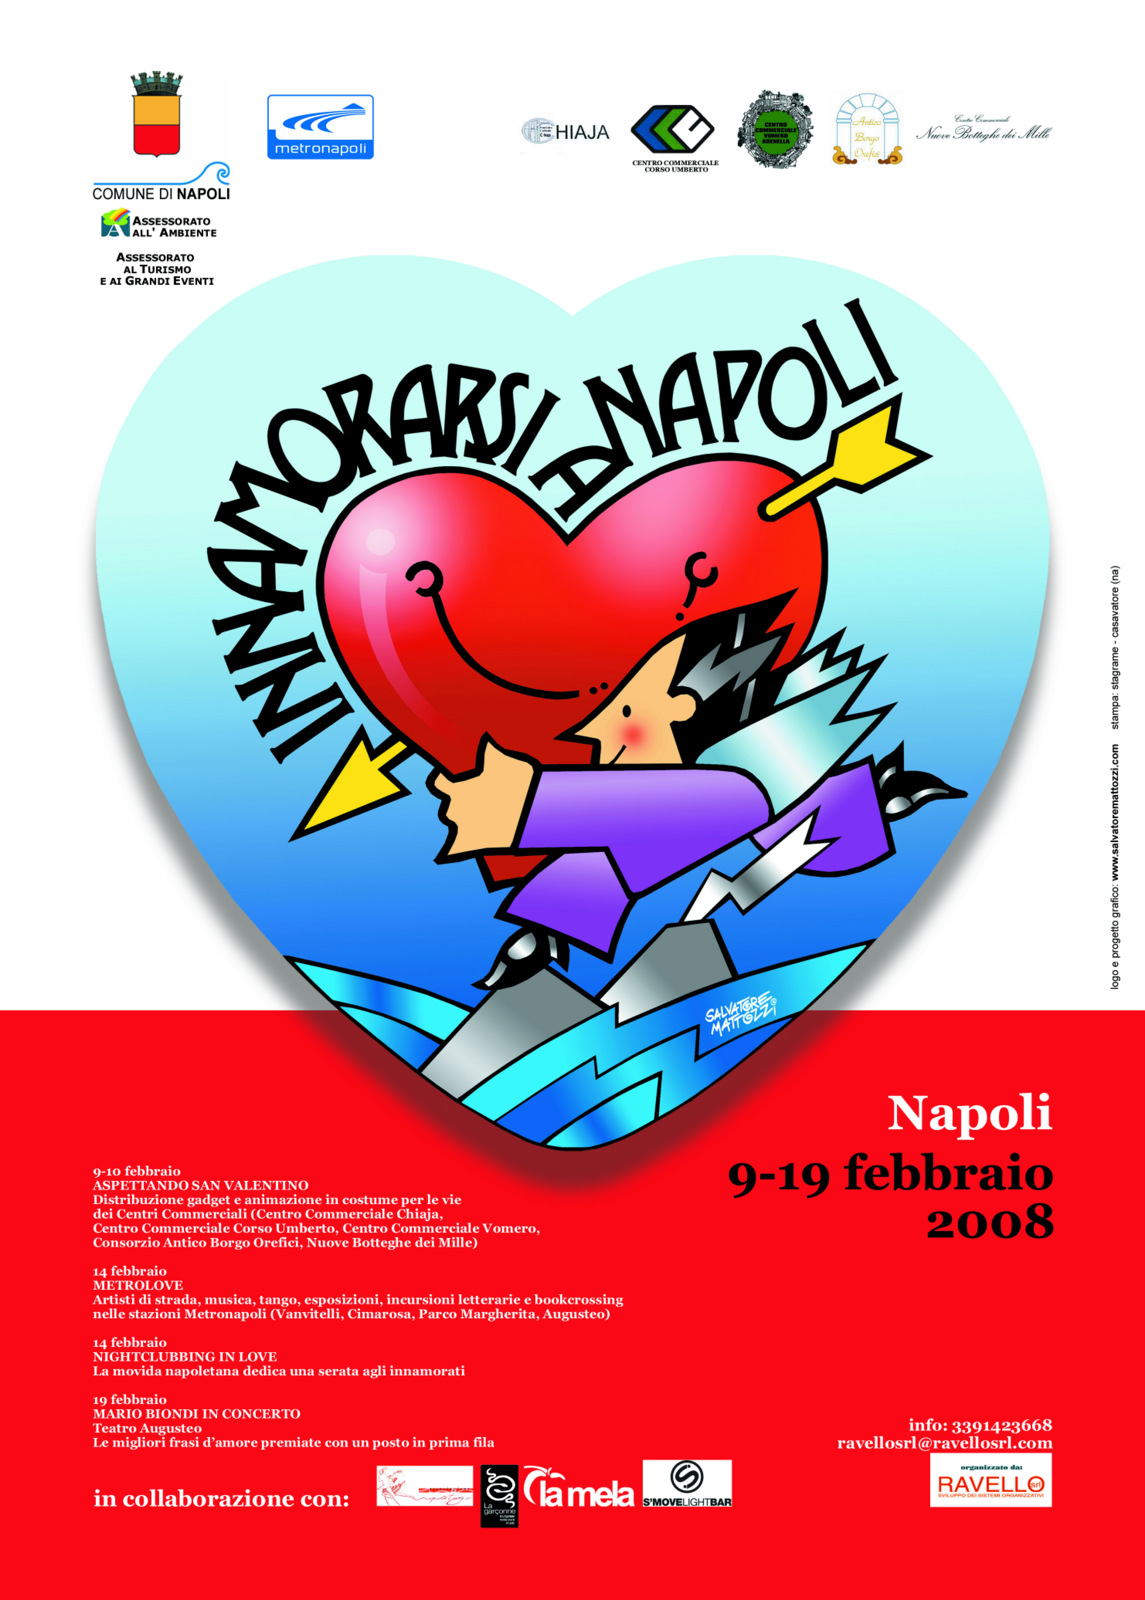 Innamorarsi a Napoli 2008